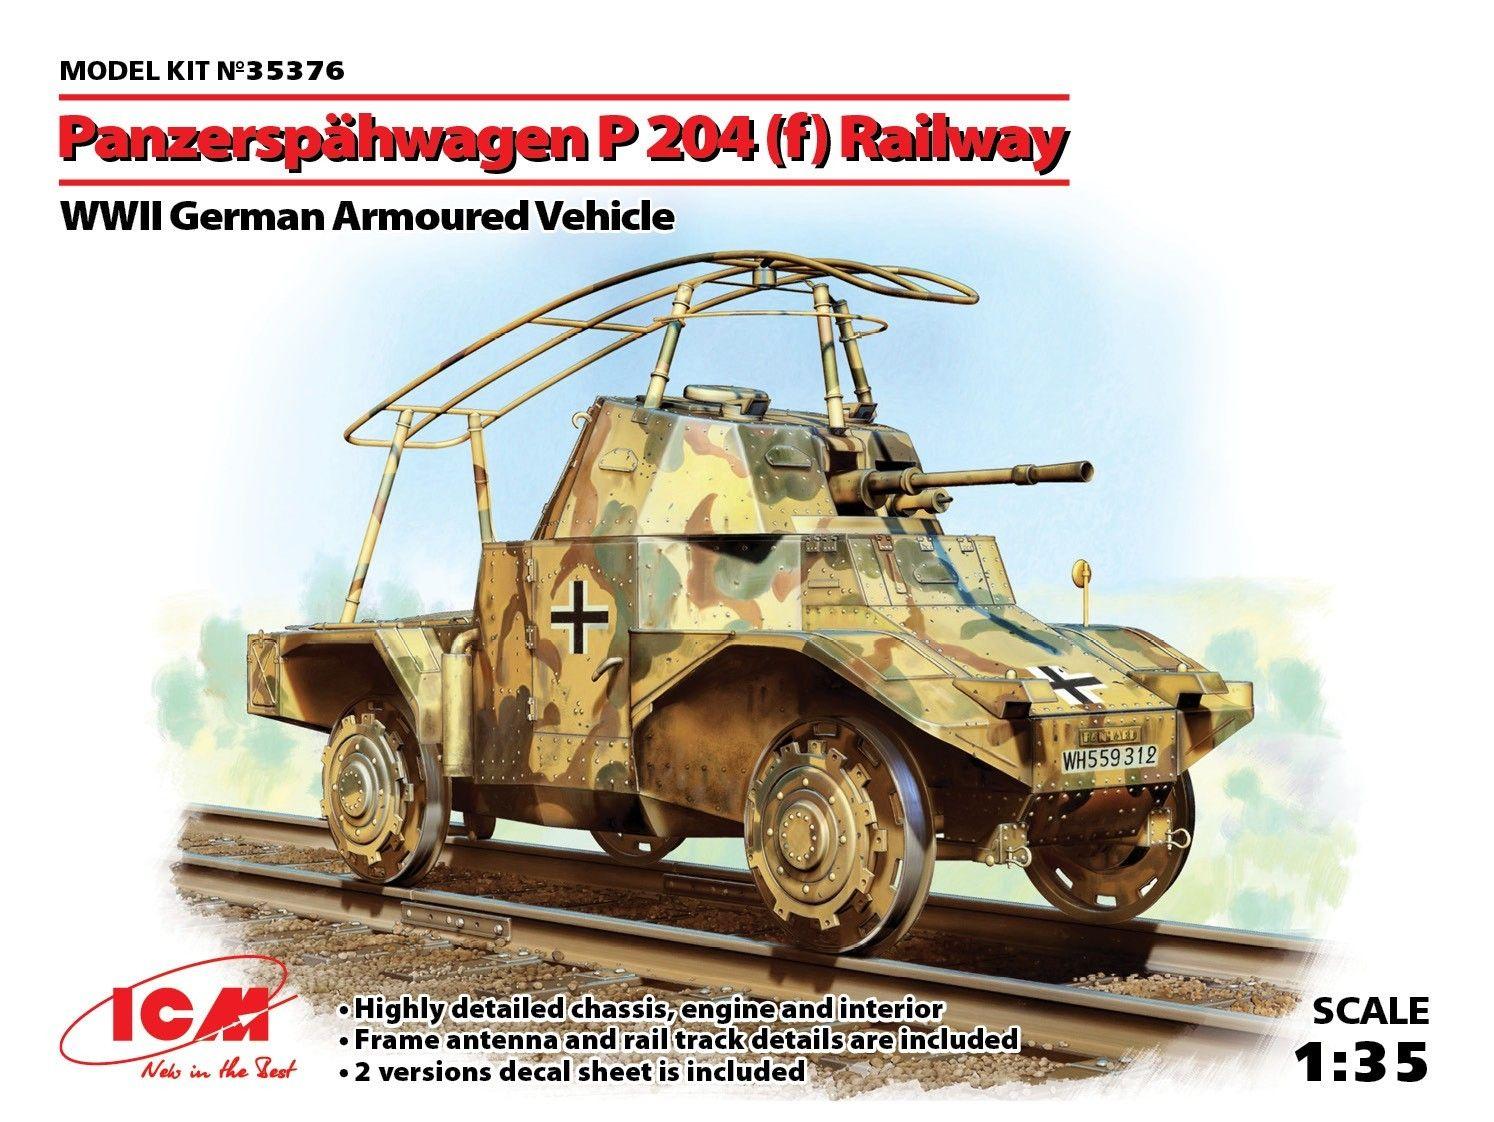 Военен сглобяем модел - Германска бронирана машина Панар П 204 за релсов път (German Armoured Vehicle Panzerspahwagen P 204(f) Railway, WWII) - 1